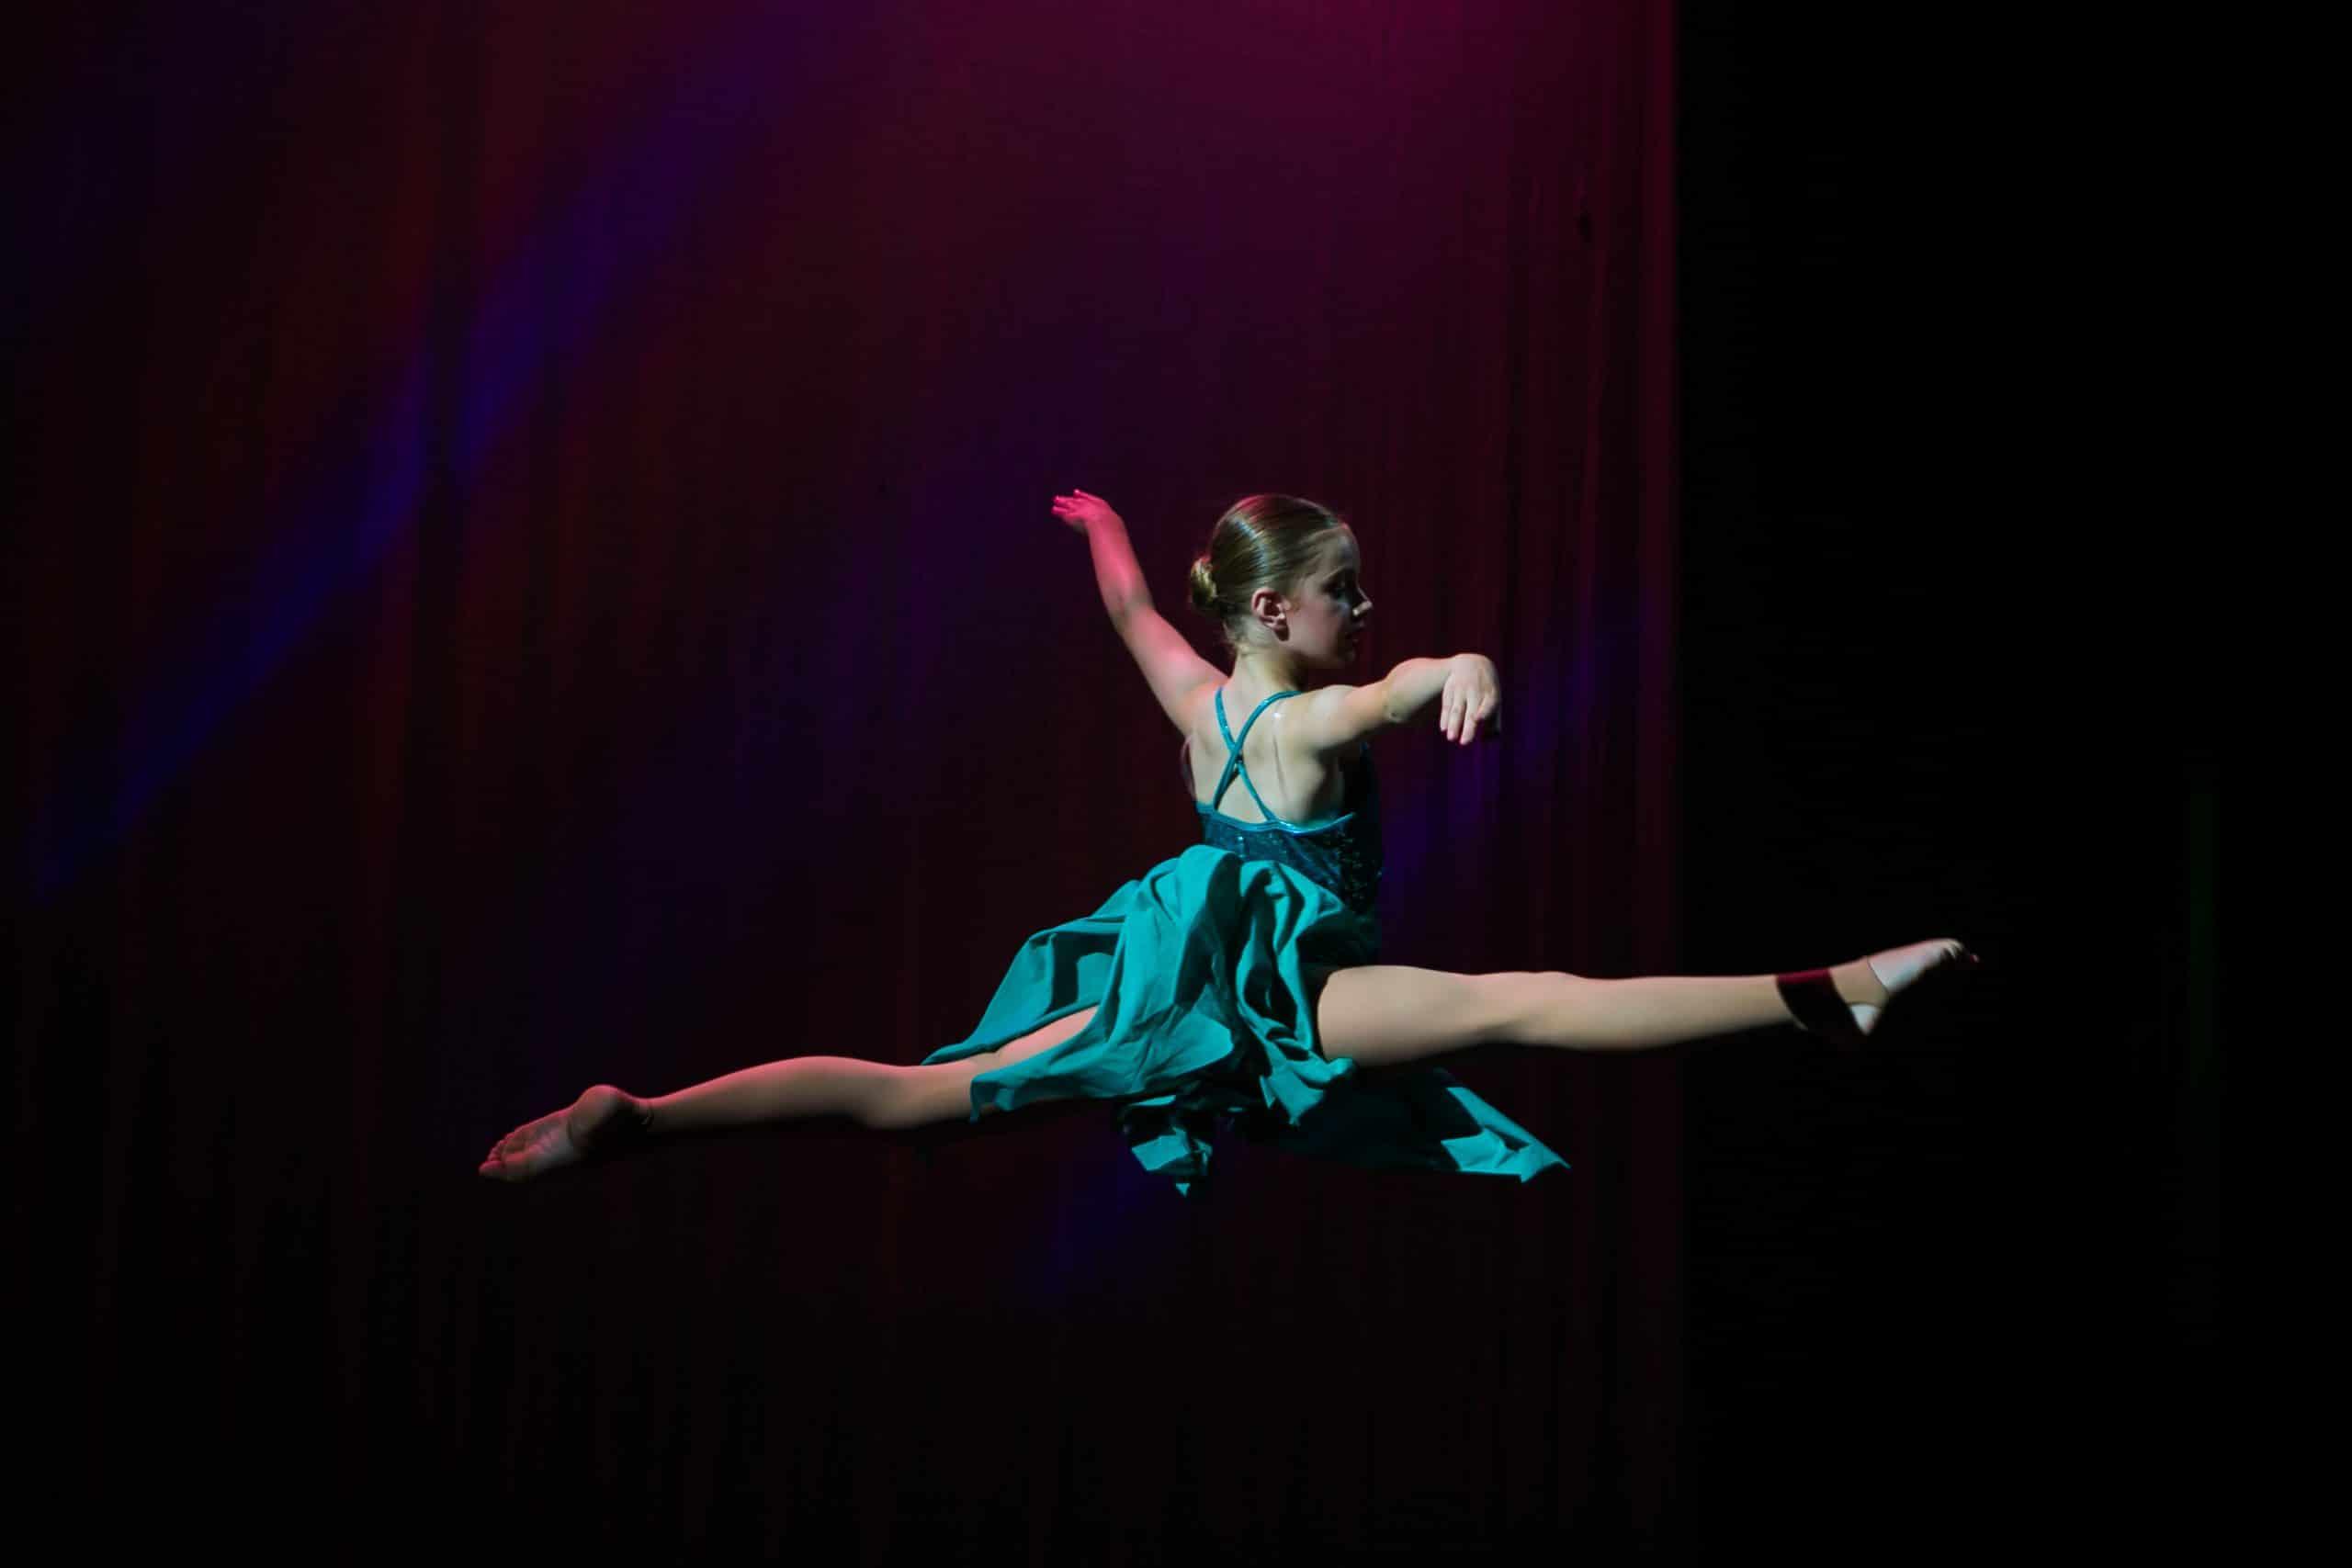 Progressing Ballet Technique Dance Classes for Kids in Woking